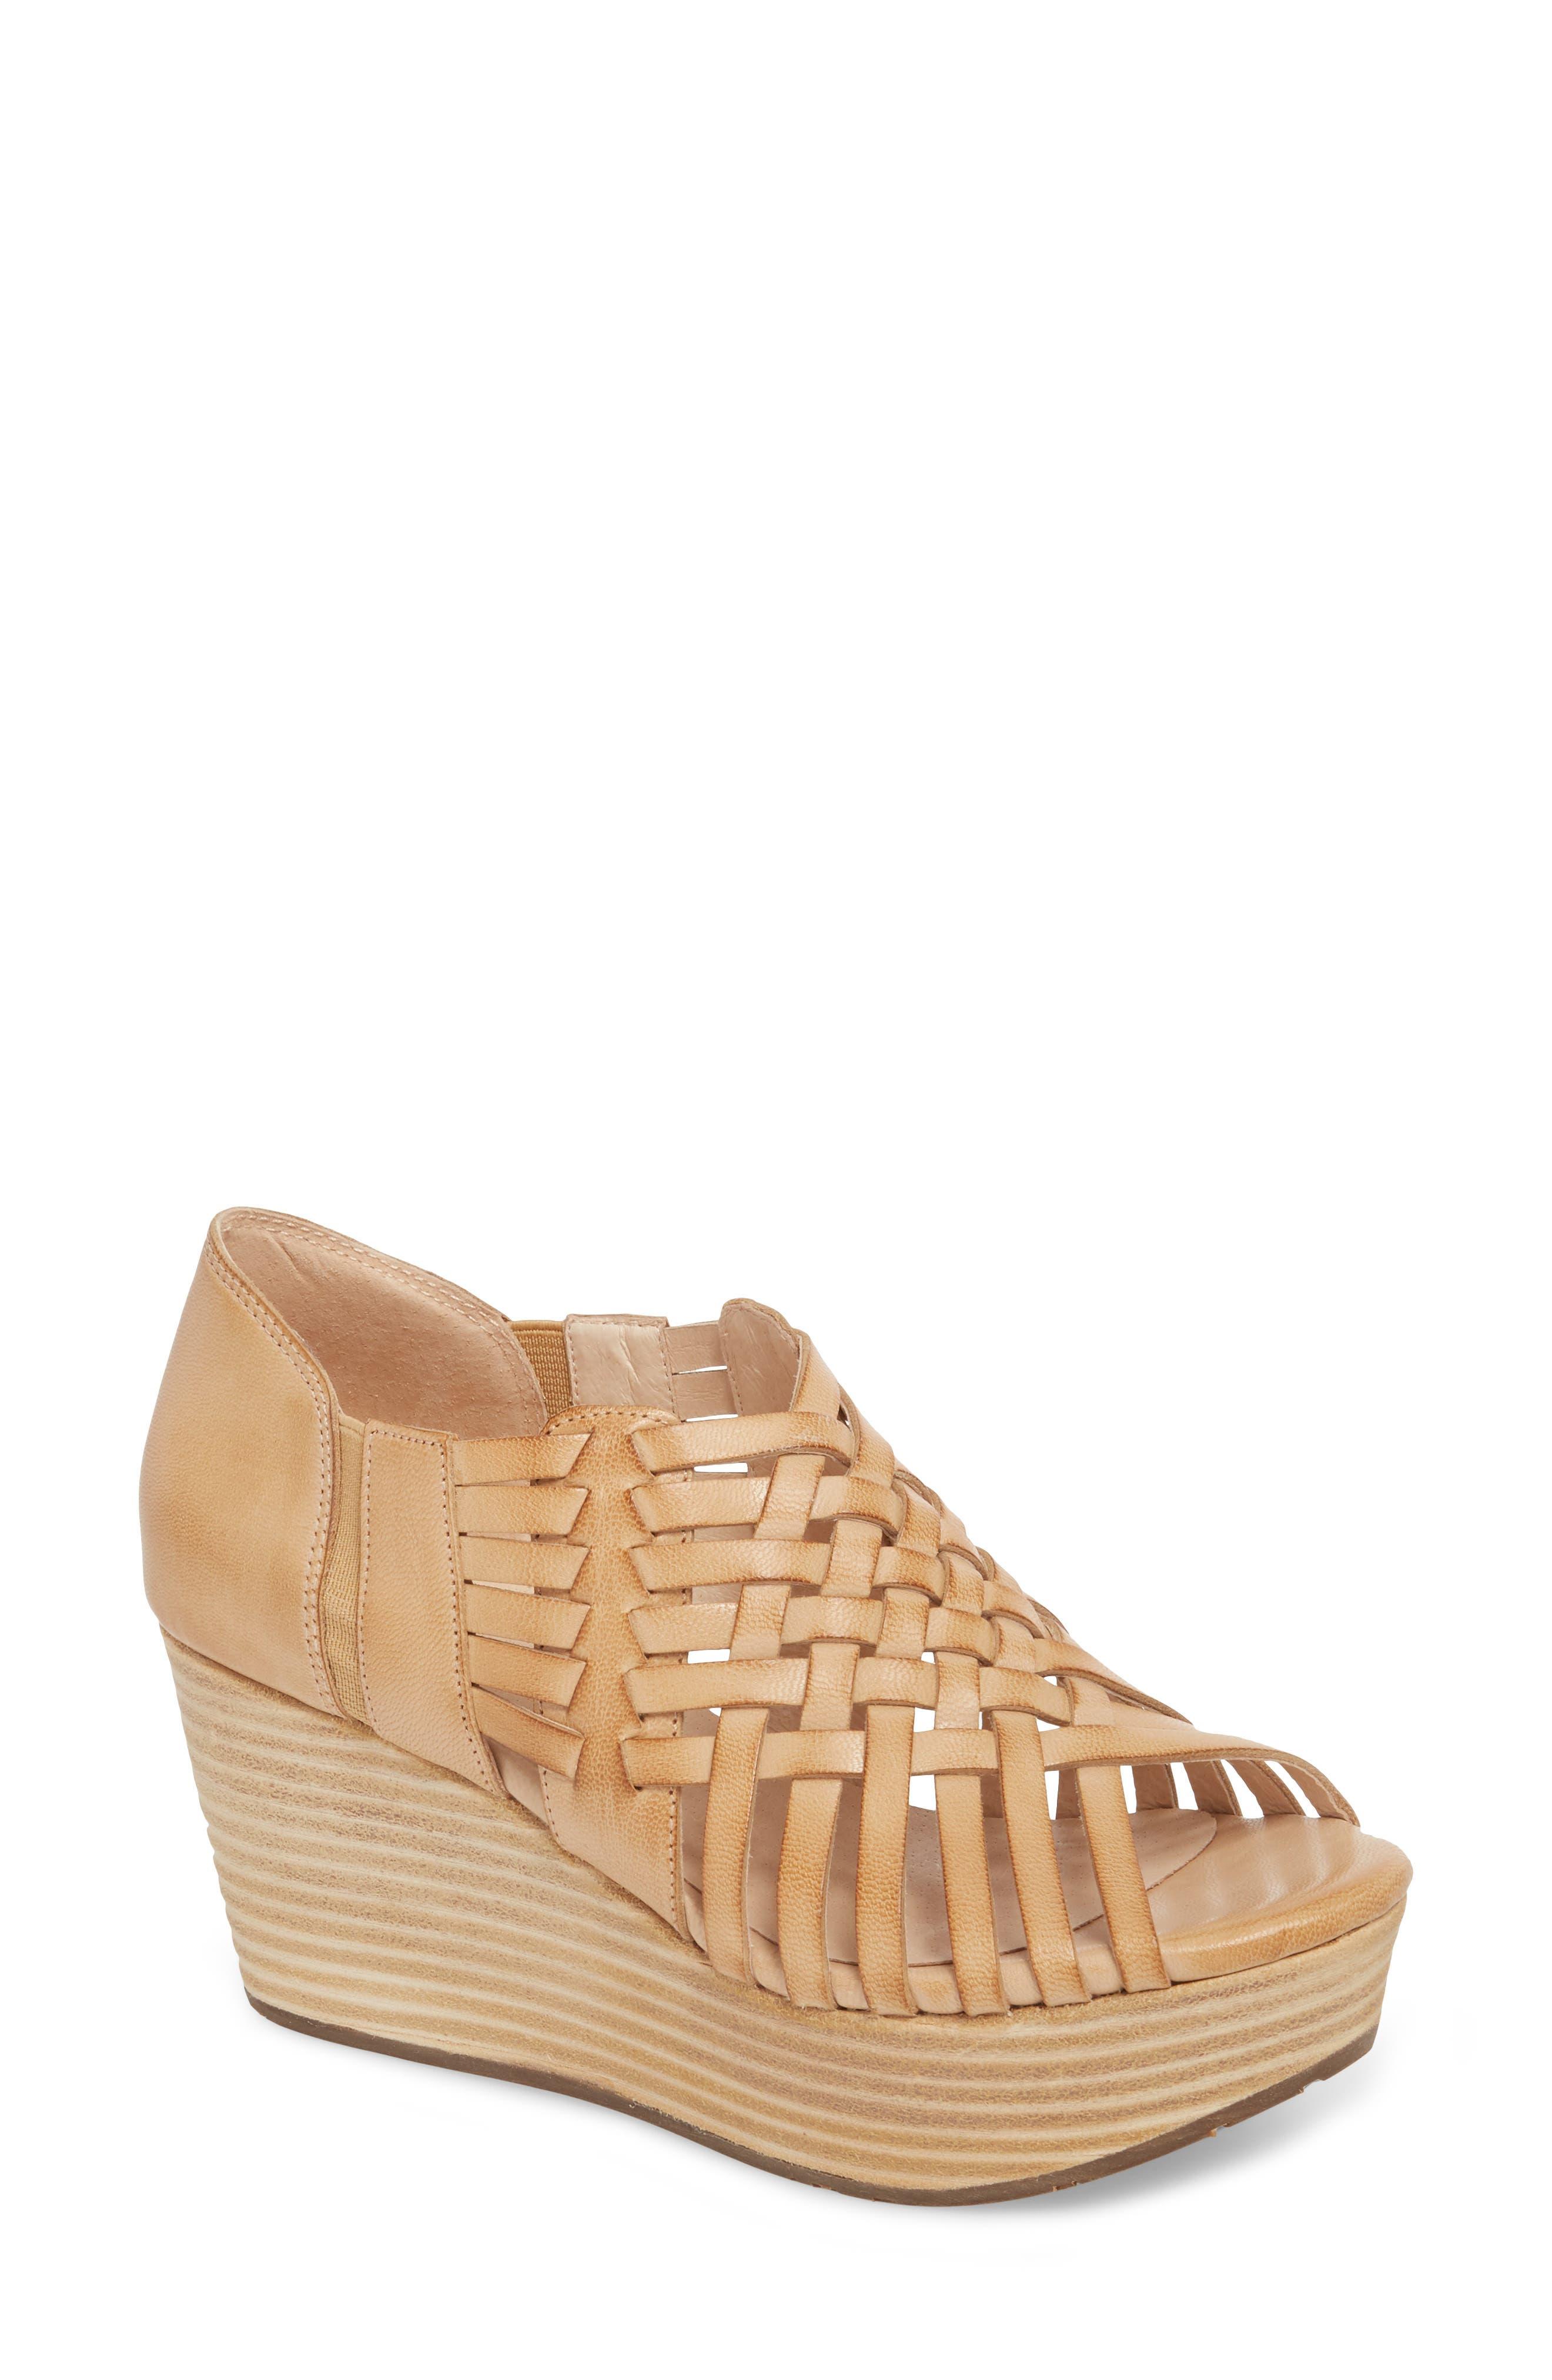 Woody Wedge Sandal,                         Main,                         color,